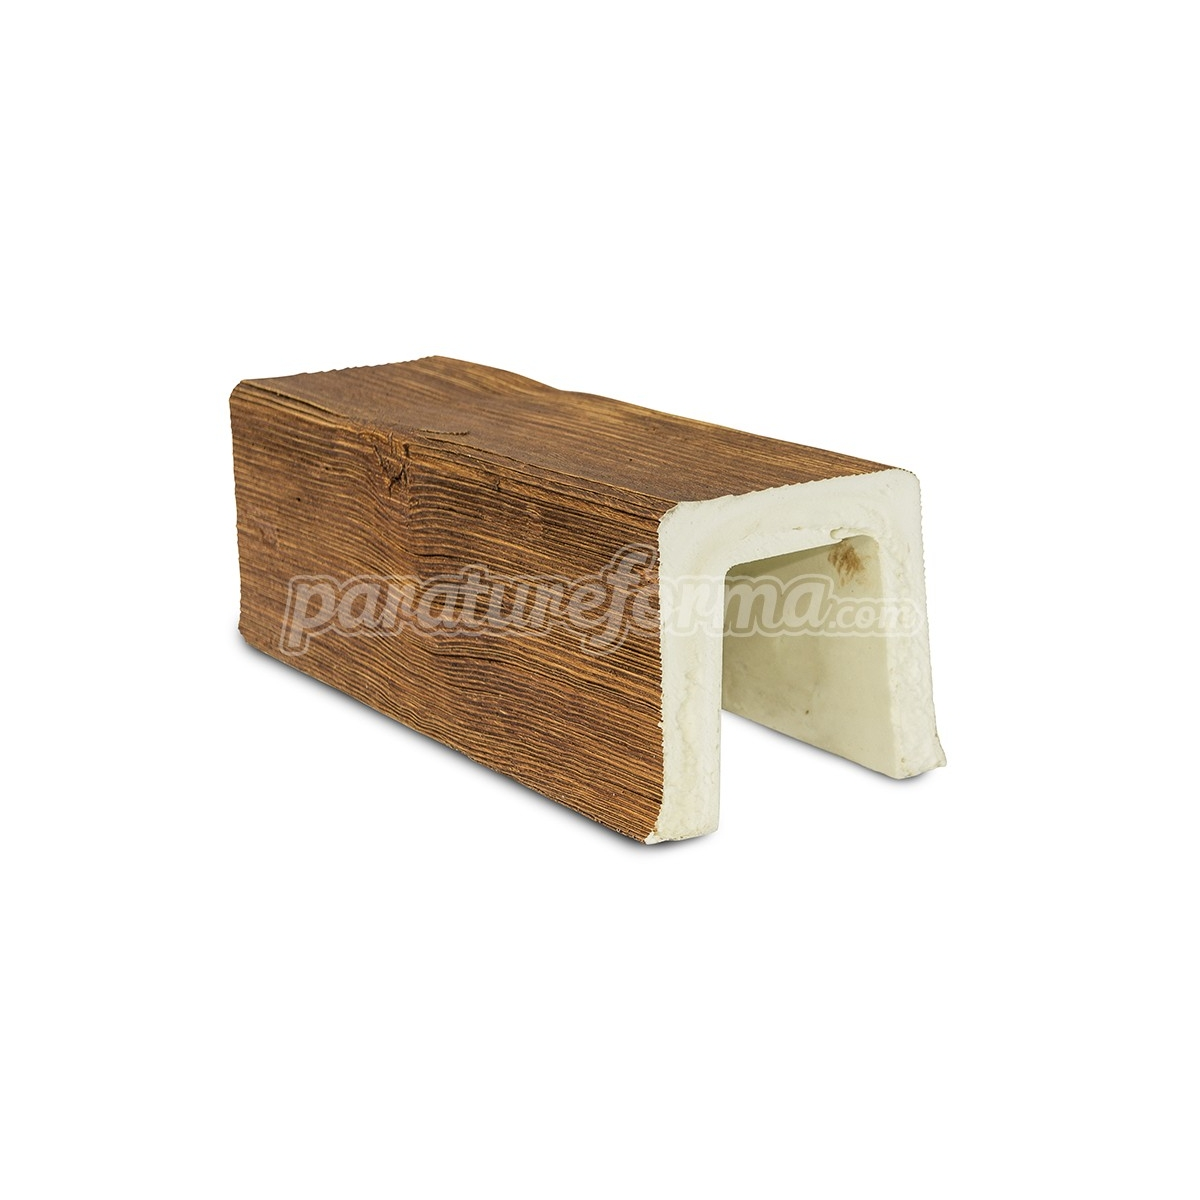 Viga imitación a madera 300x10x10 - Vigas imitación madera cuadradas